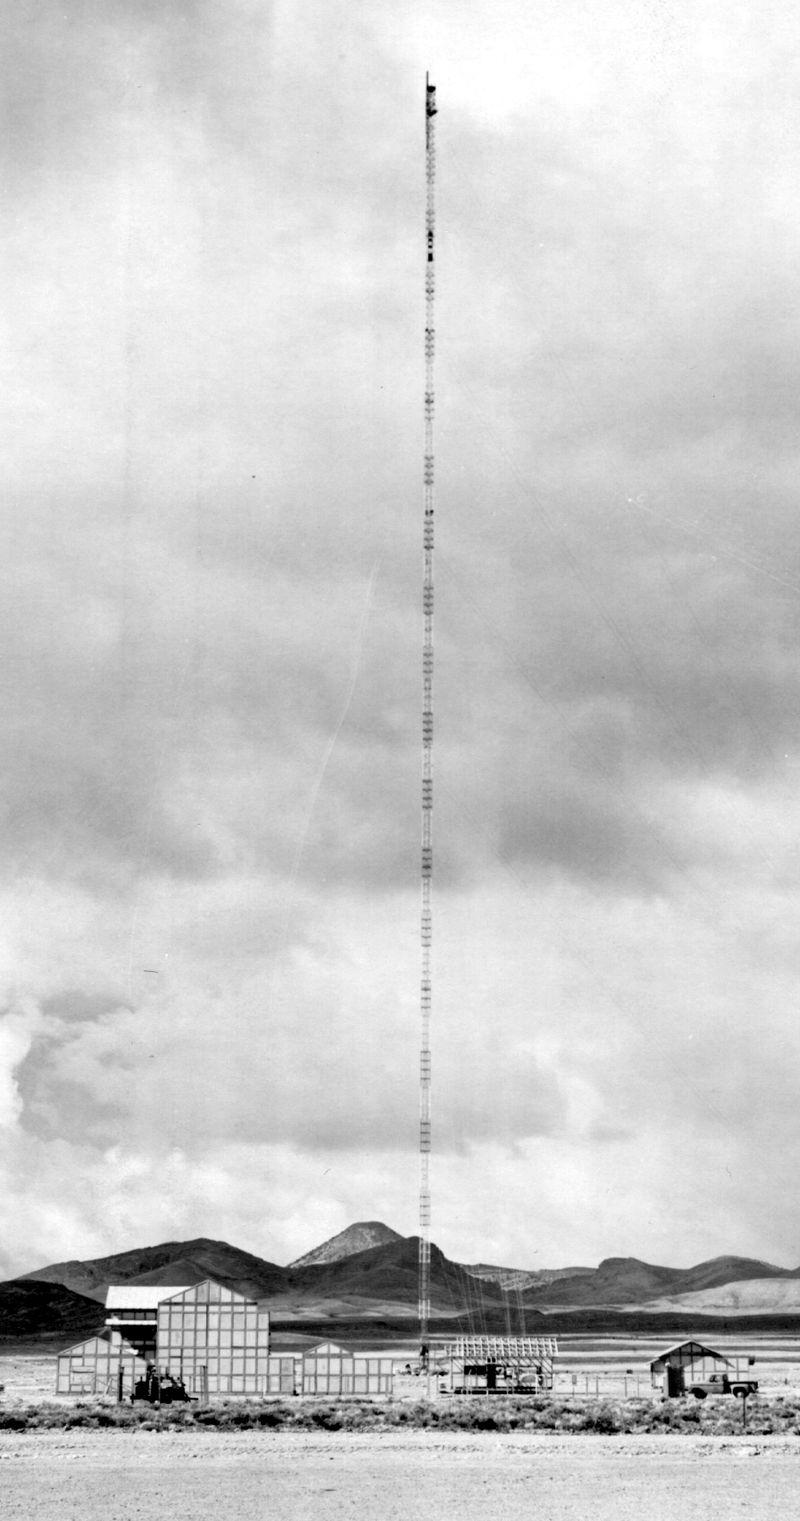 800px-BREN_Tower_nevada.jpg